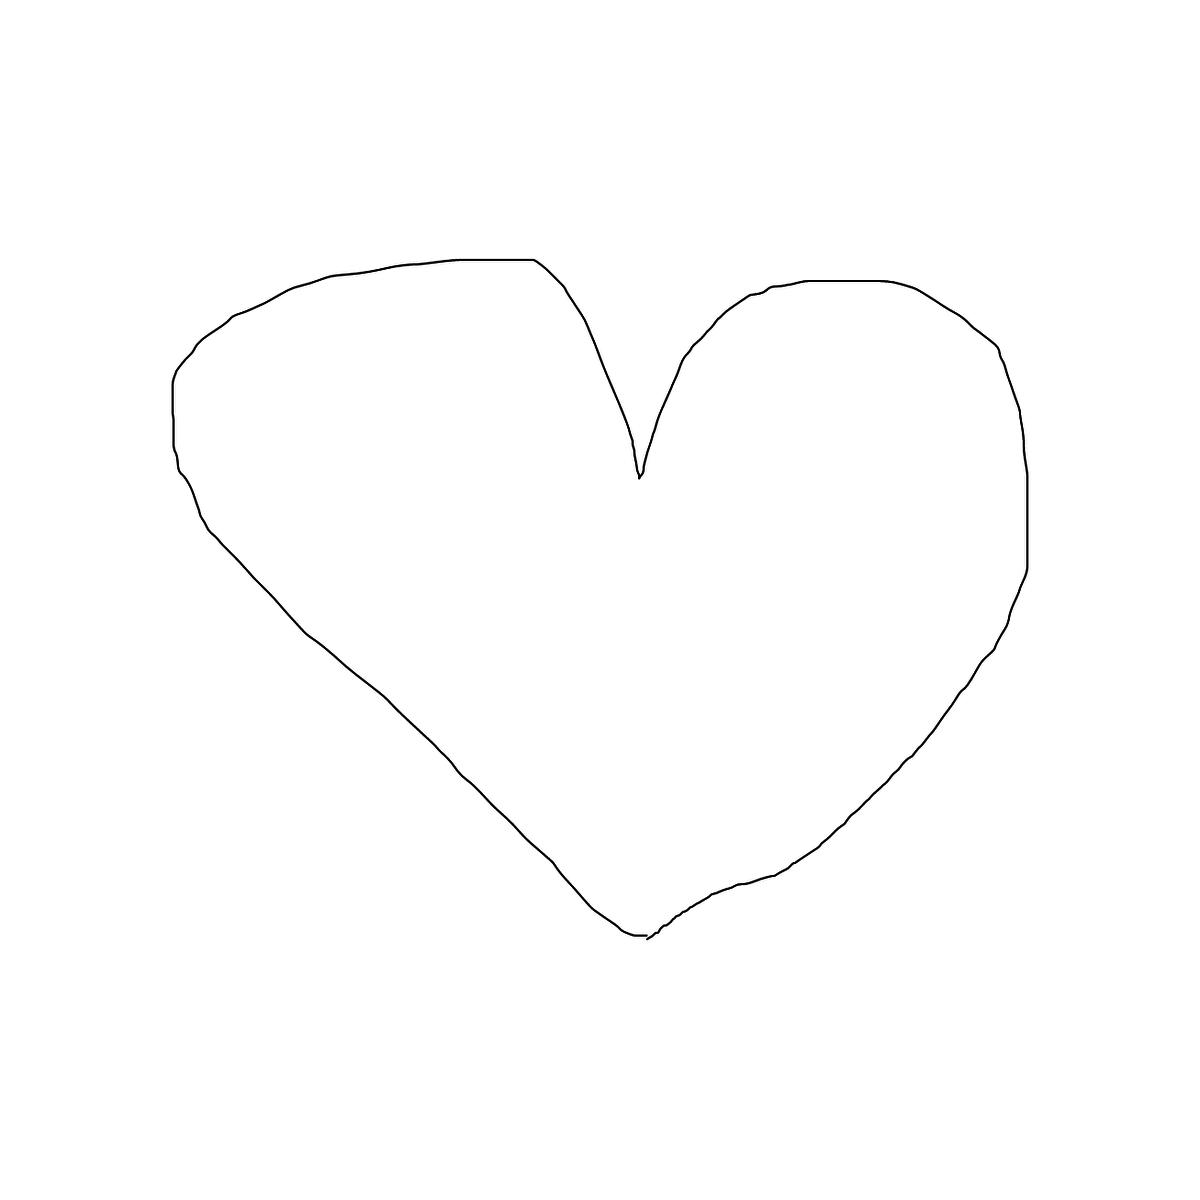 BAAAM drawing#11311 lat:52.3481025695800800lng: 4.8469338417053220